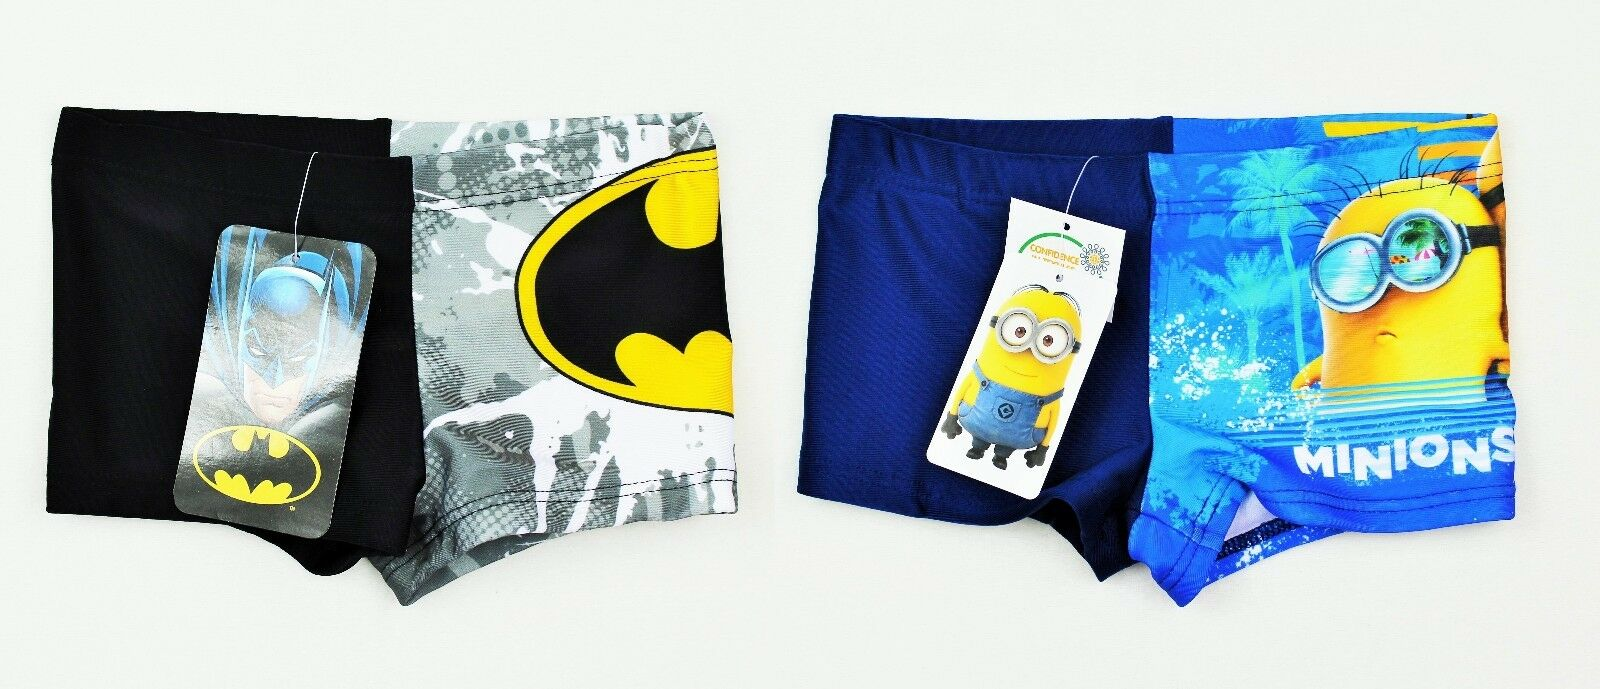 NEU Batman o. Minions Jungen Shorts / Schwimmhose / Hose / Badehose - Gr. 98/104